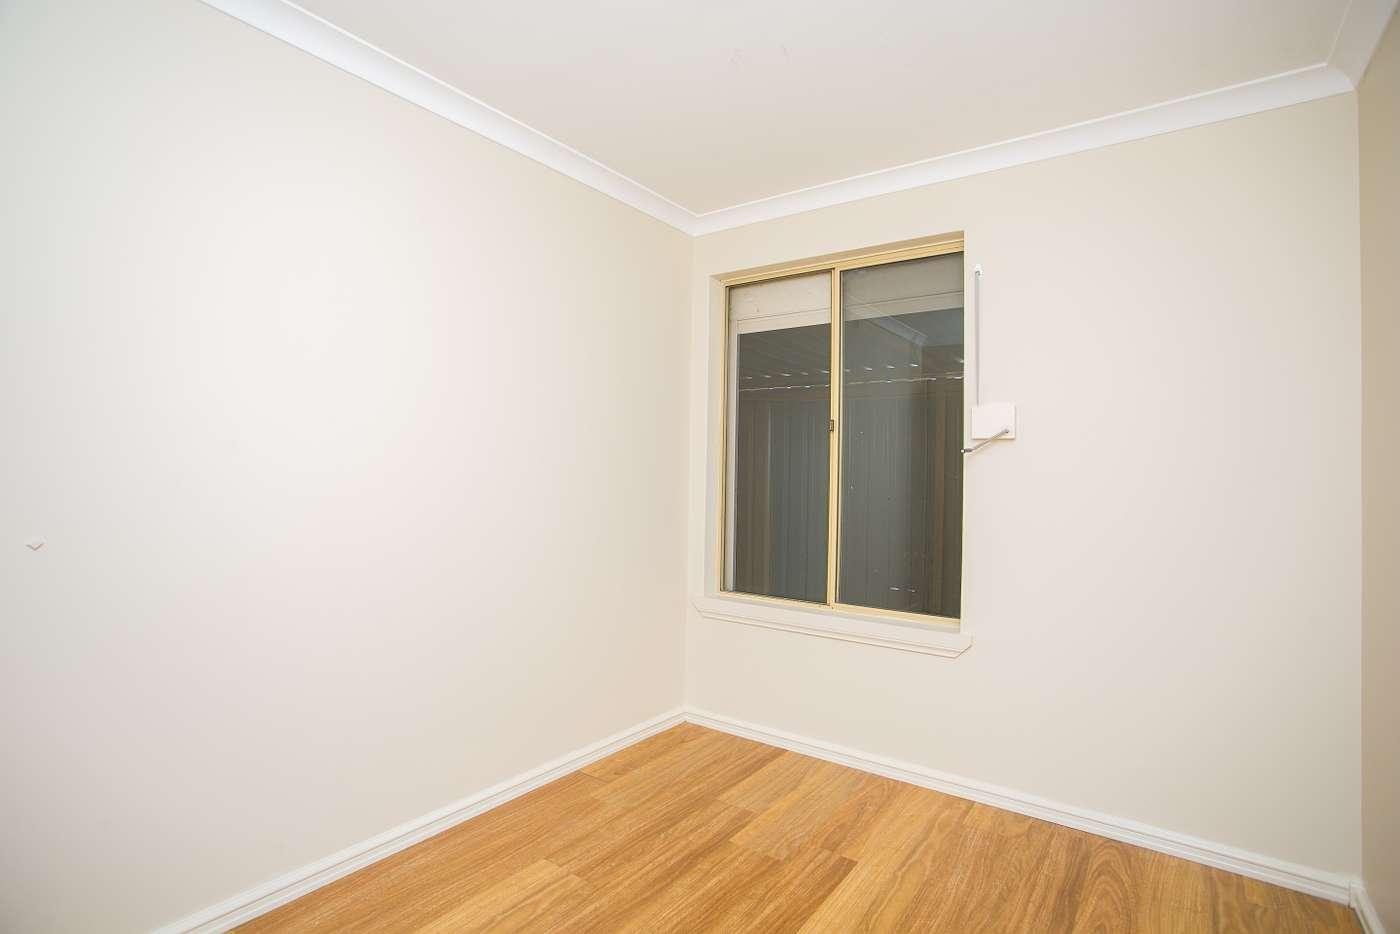 Seventh view of Homely house listing, 22 Ottawa Crescent, Beechboro WA 6063